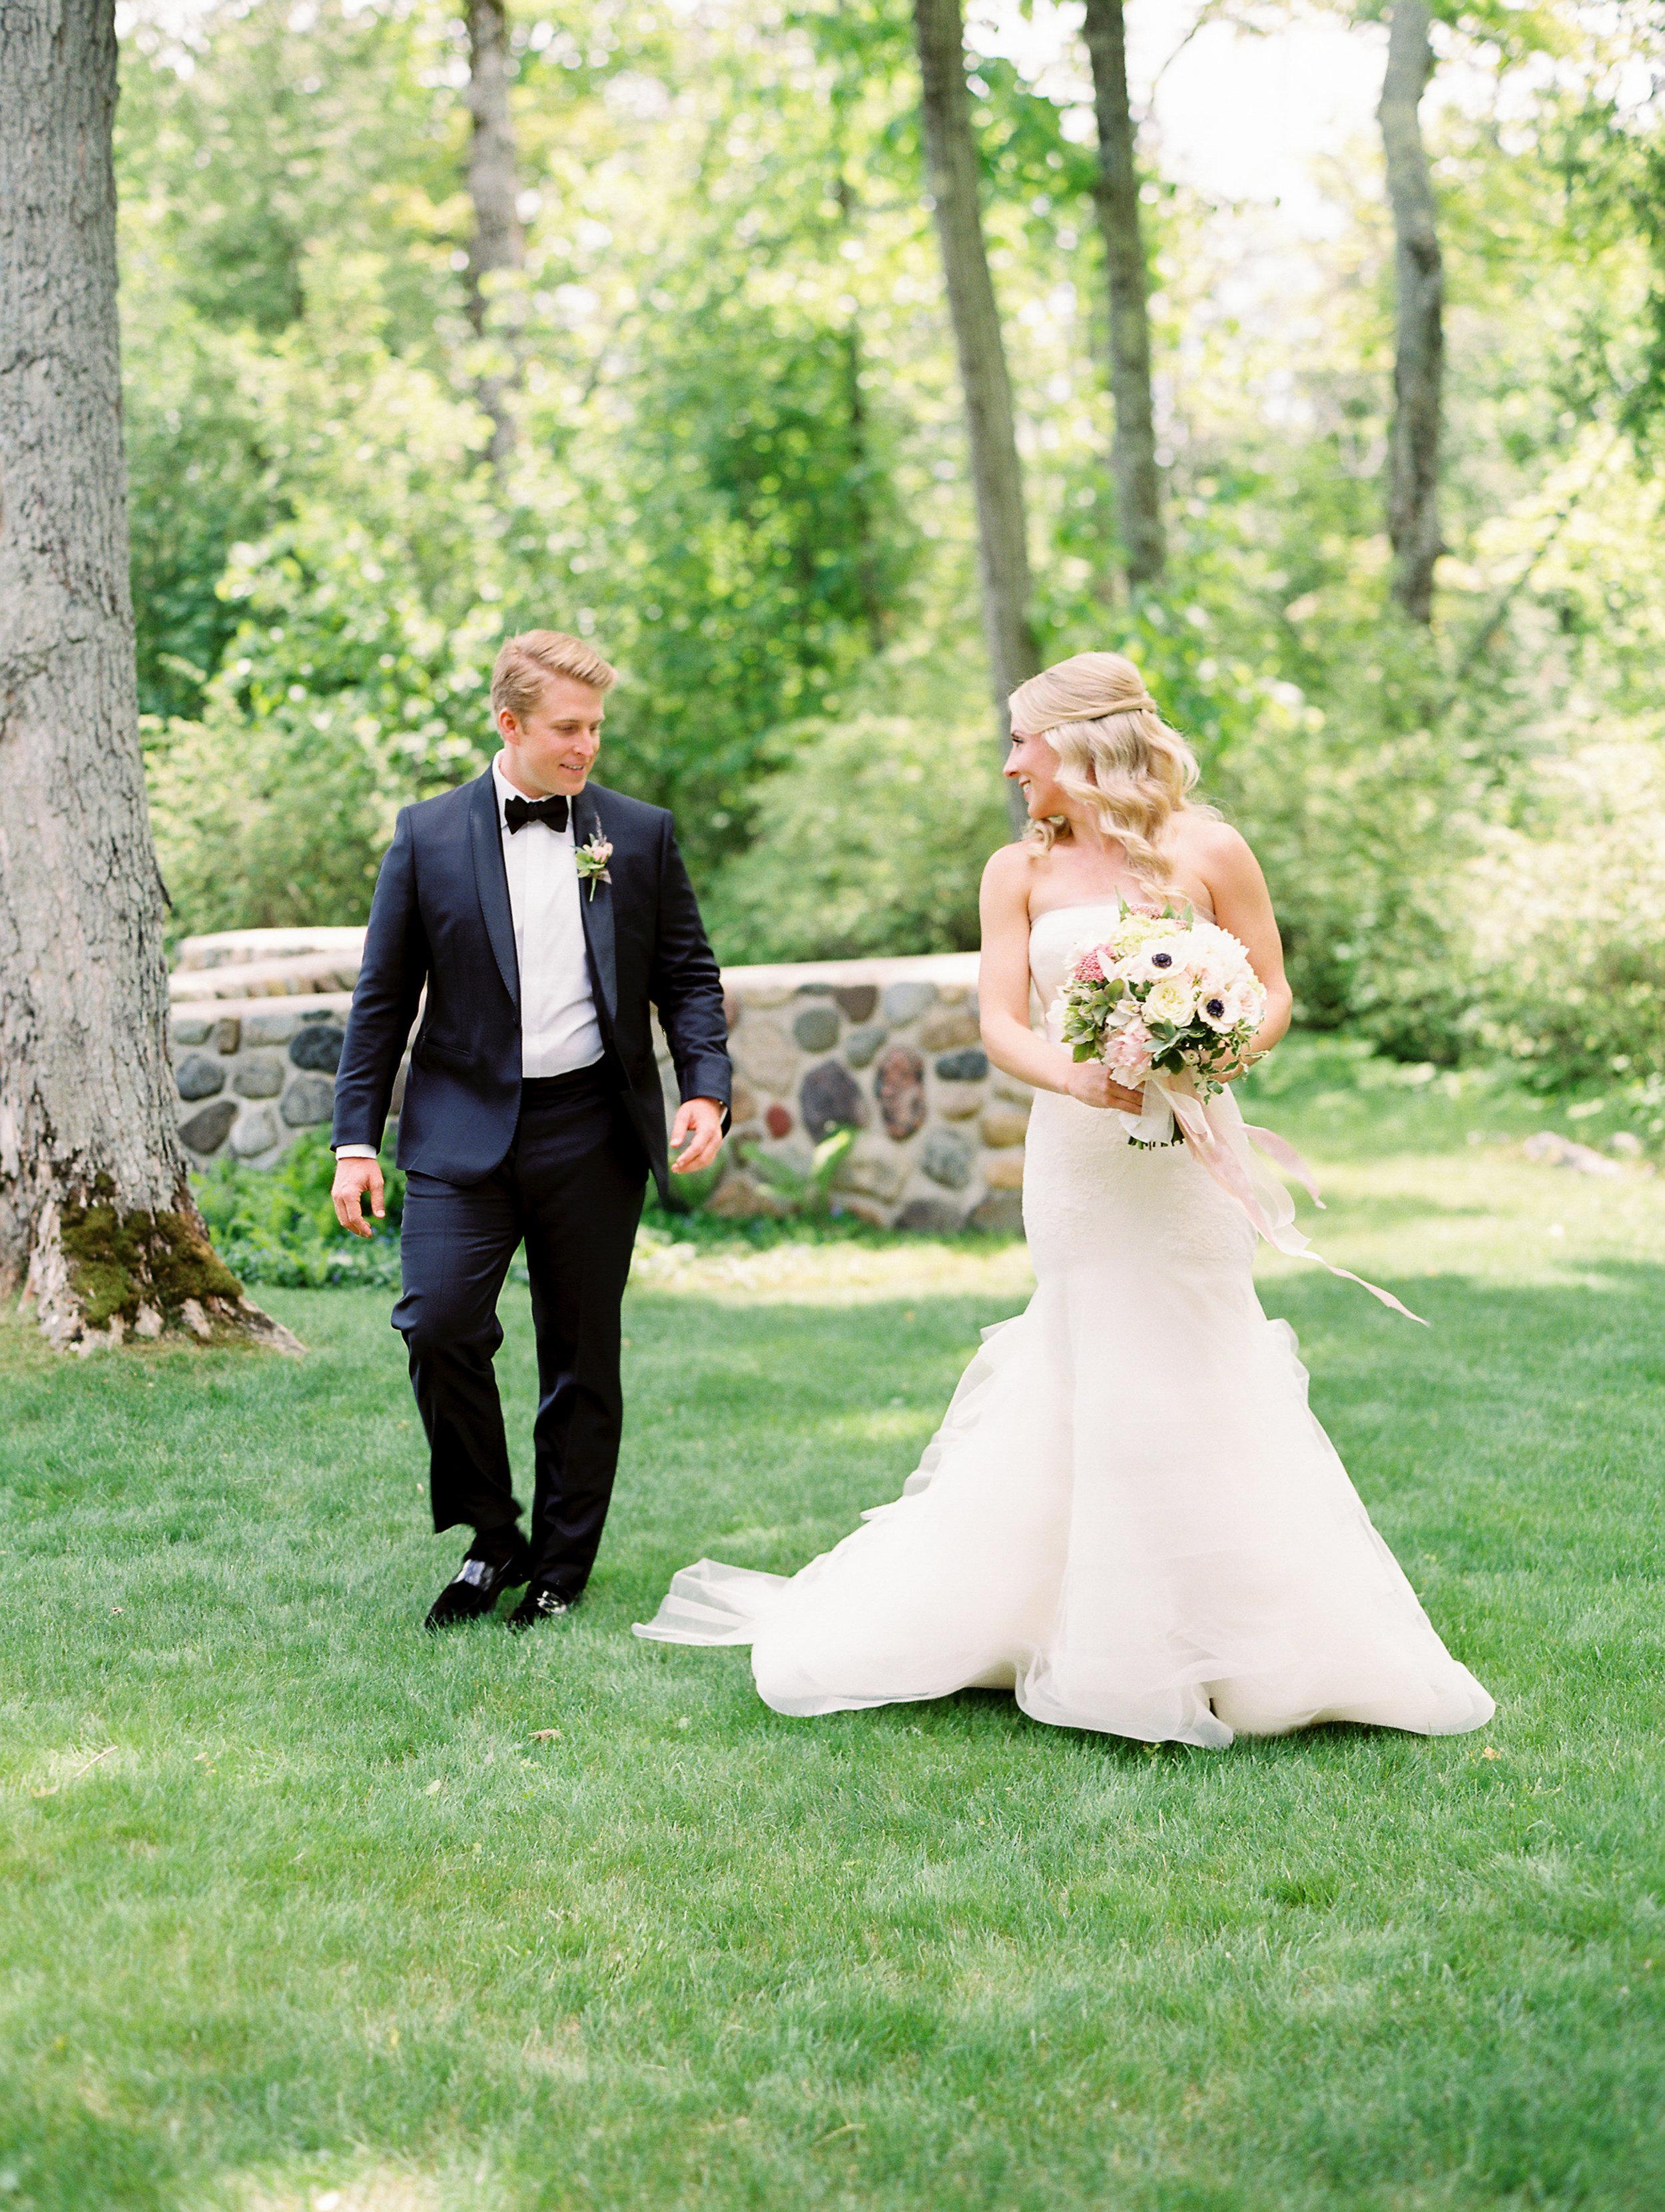 Coffman+Wedding+First+Look-24.jpg